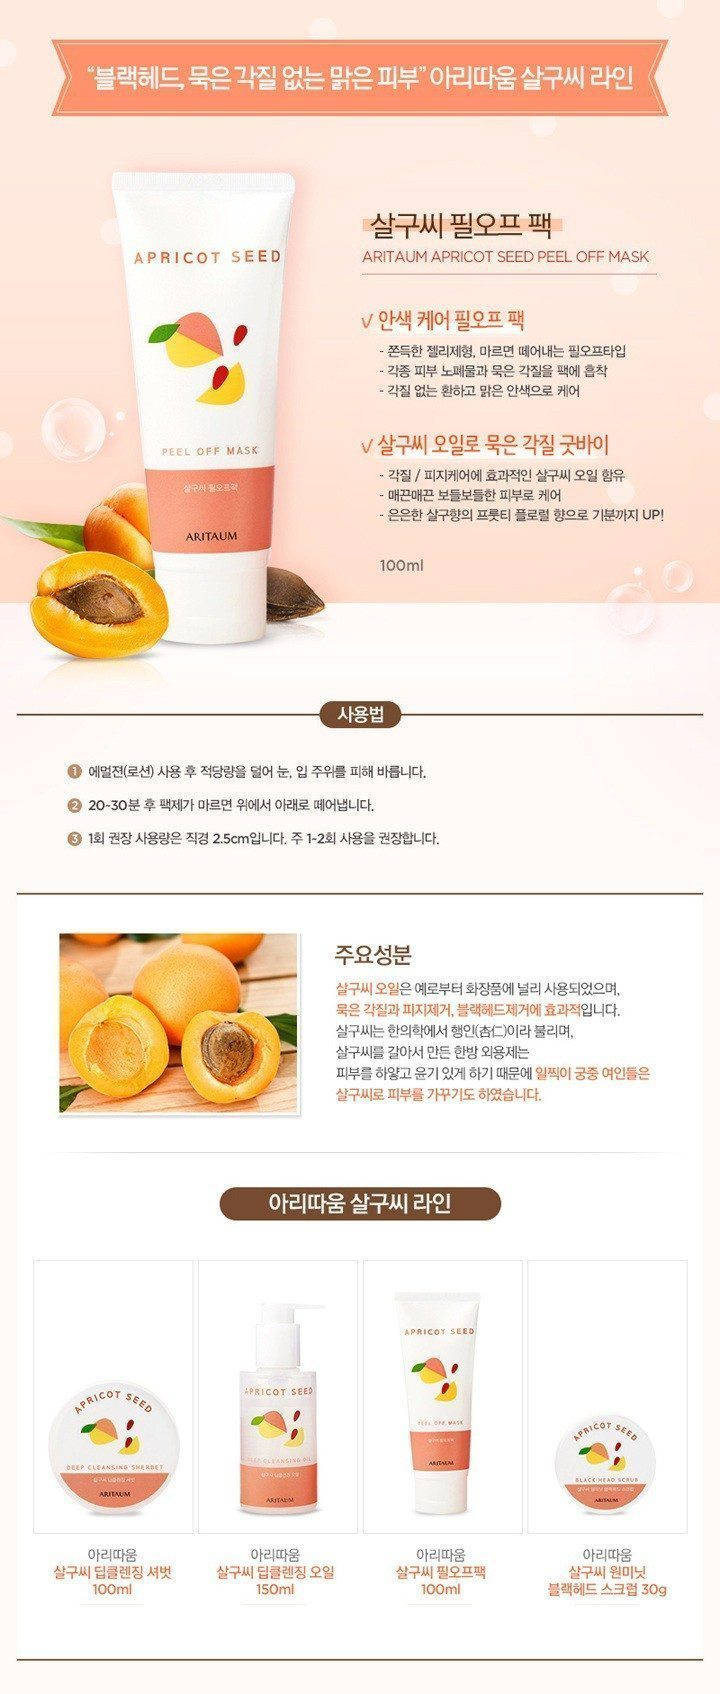 ARITAUM Apricot Seed Cleansing Peel-Off Mask 100ml